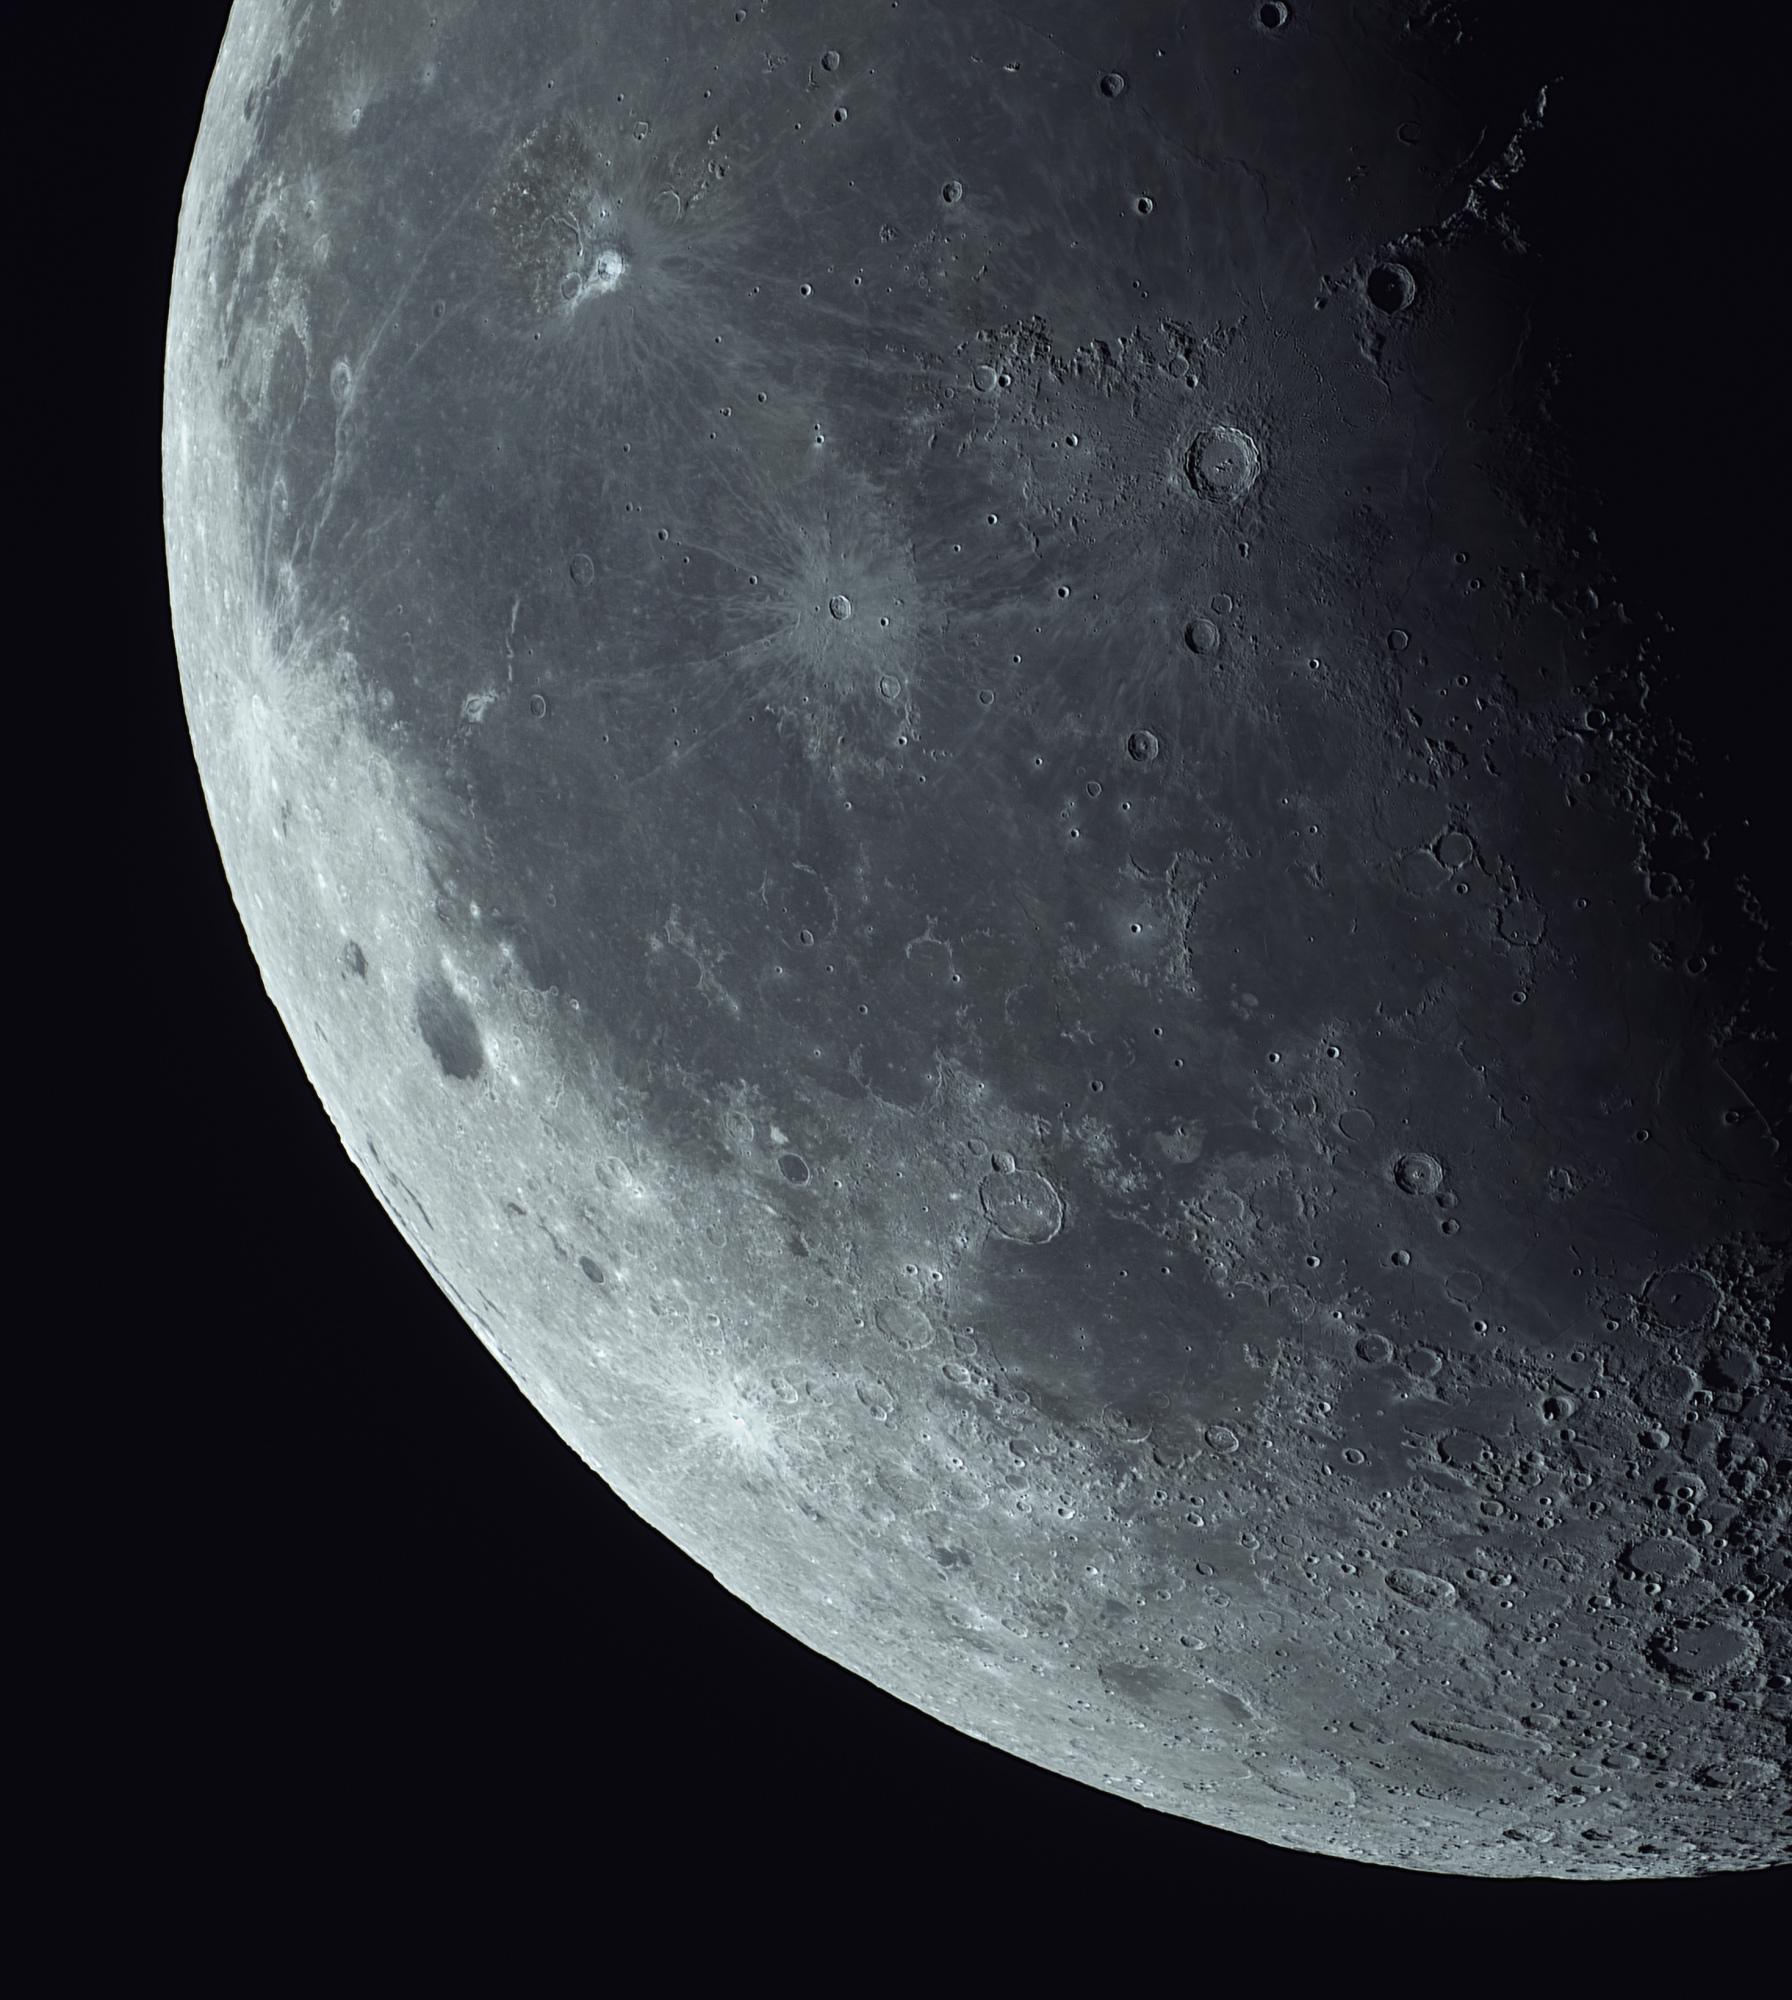 lune_test_filtered.jpg.80e0e31b0007921b225914b408796b42.jpg